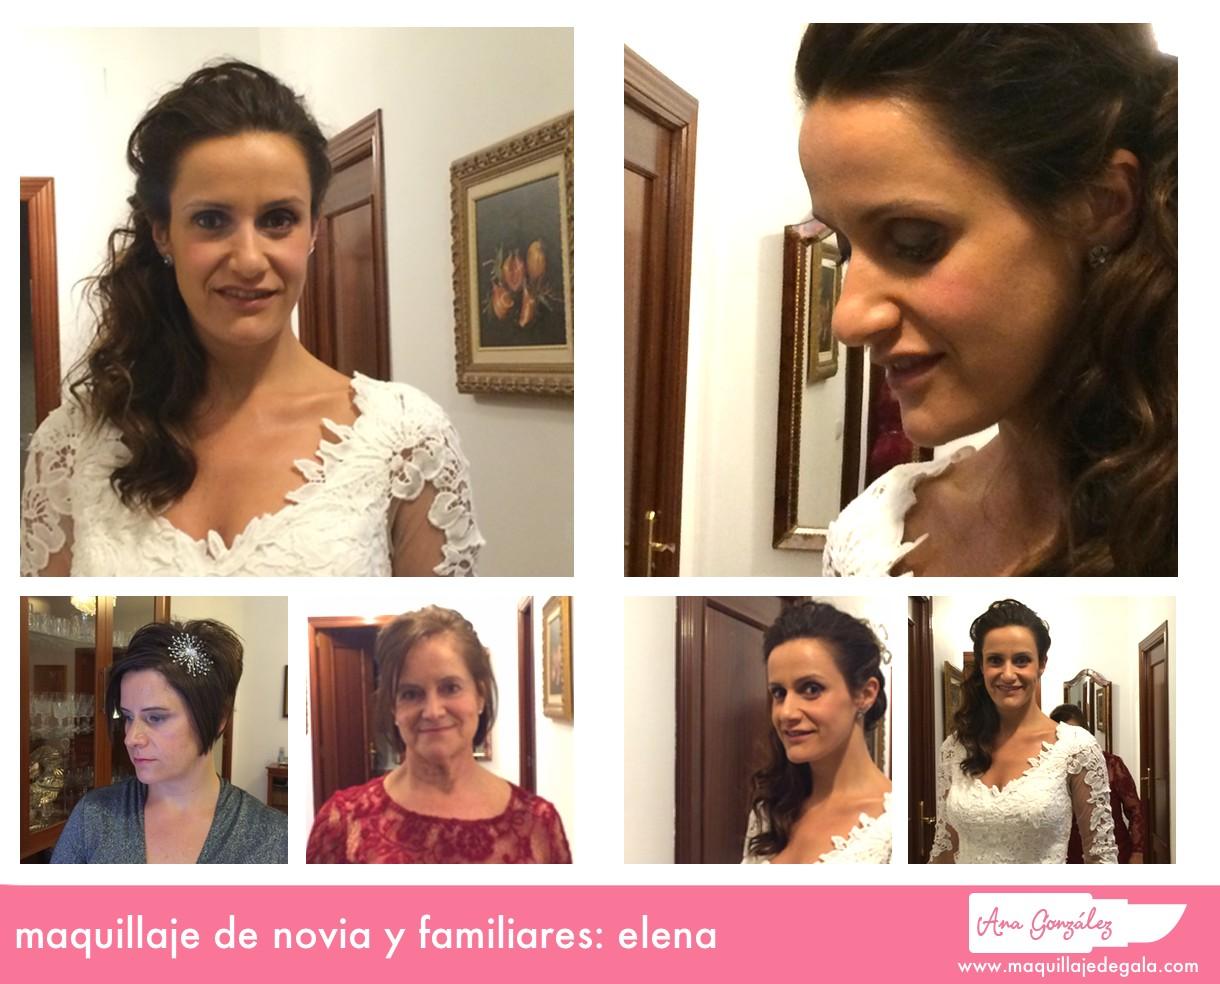 maquillaje-de-novia-familiares-elena